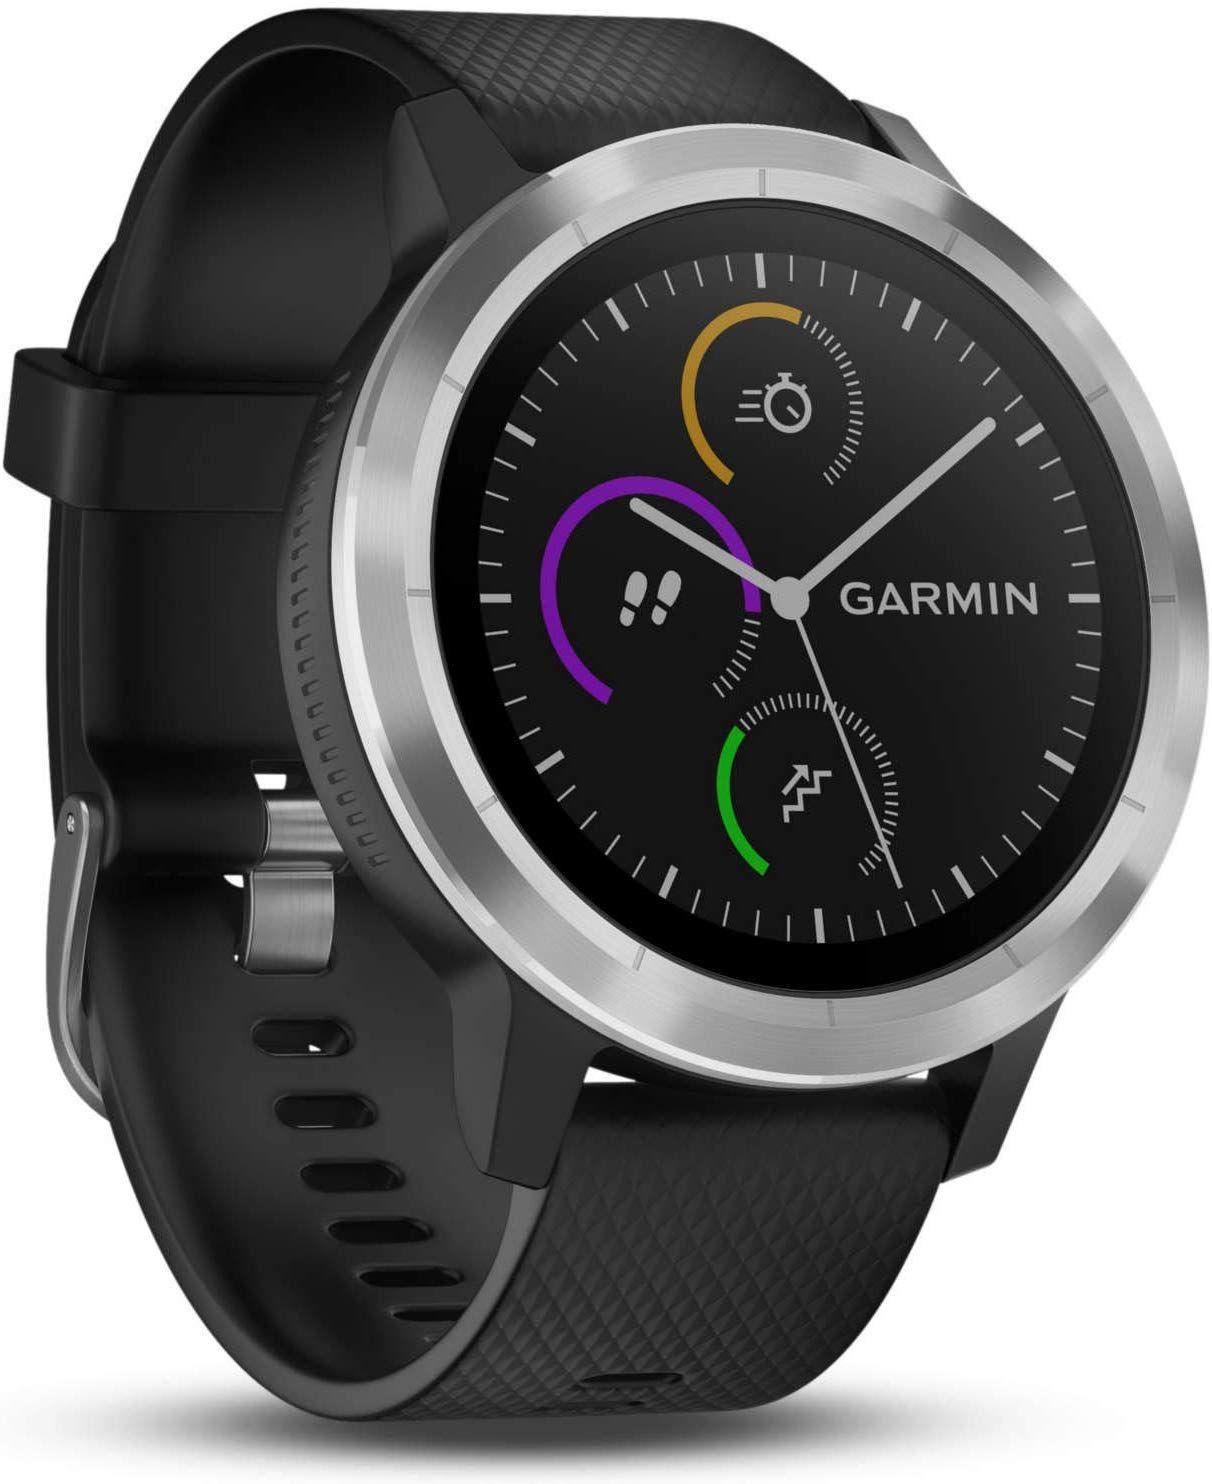 Garmin Vivoactive 3 GPS-Fitness-Smartwatch Amazon WHD  Gebraucht - Wie neu